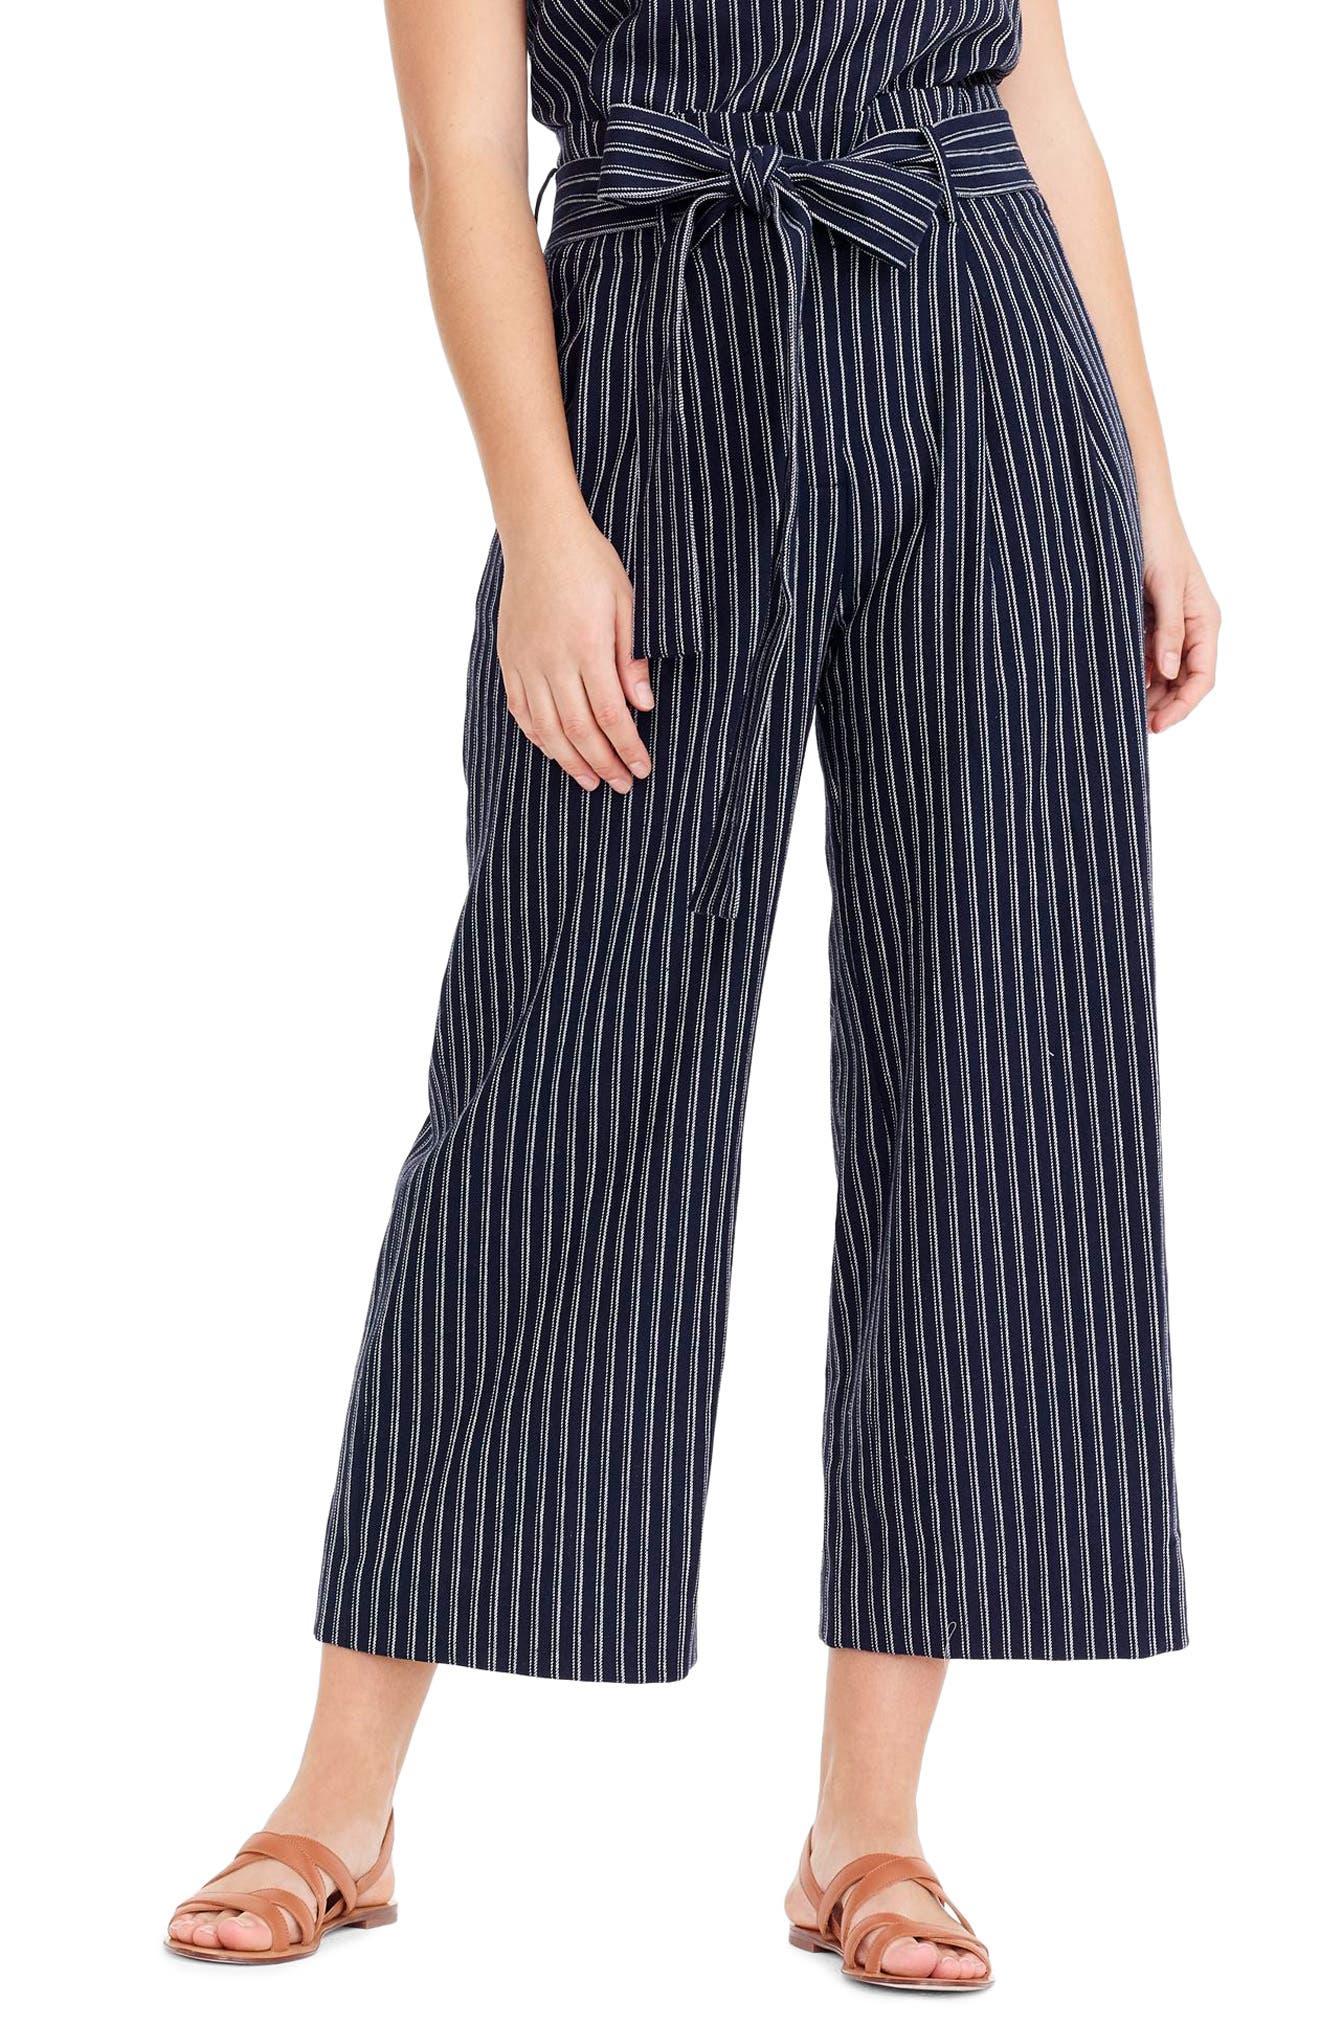 Point Sur Paperbag Pants,                         Main,                         color, Navy White Stripe